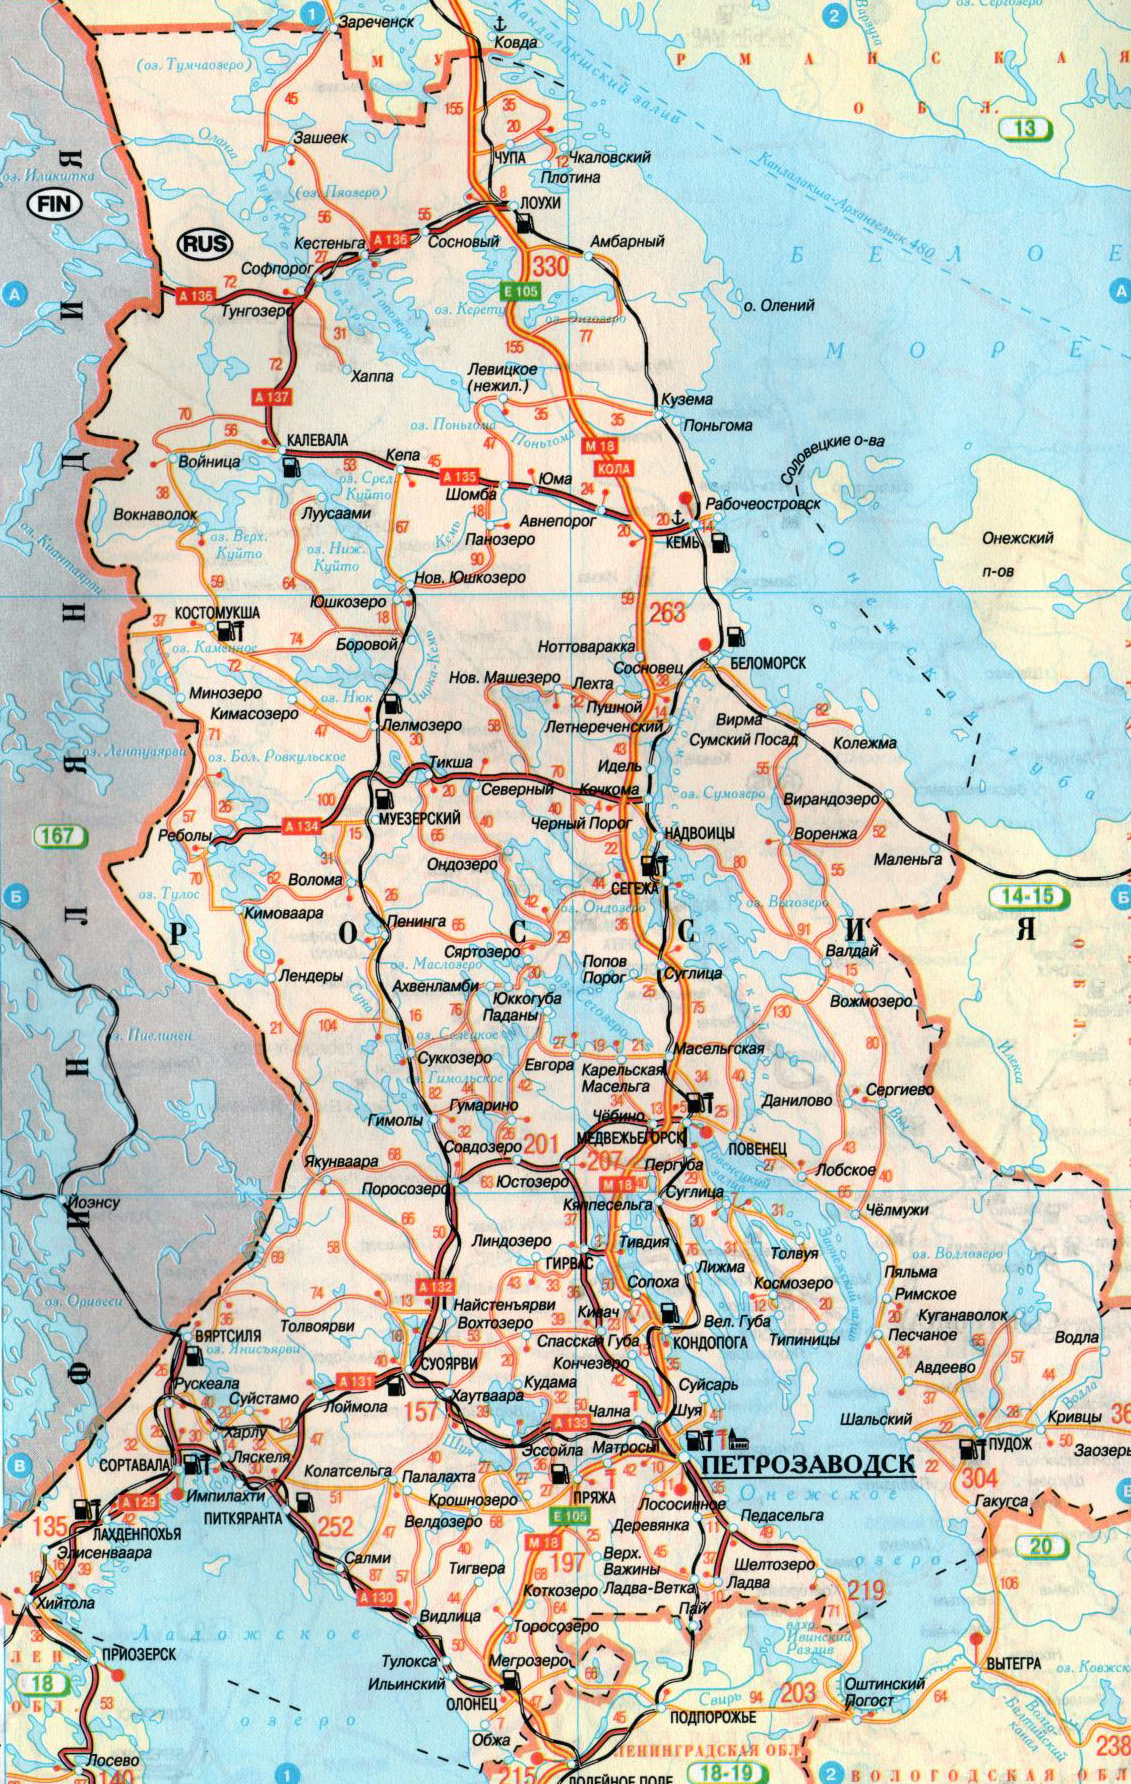 Карелия на карте России | Инфокарт – все карты сети: http://www.infokart.ru/kareliya-na-karte-rossii/